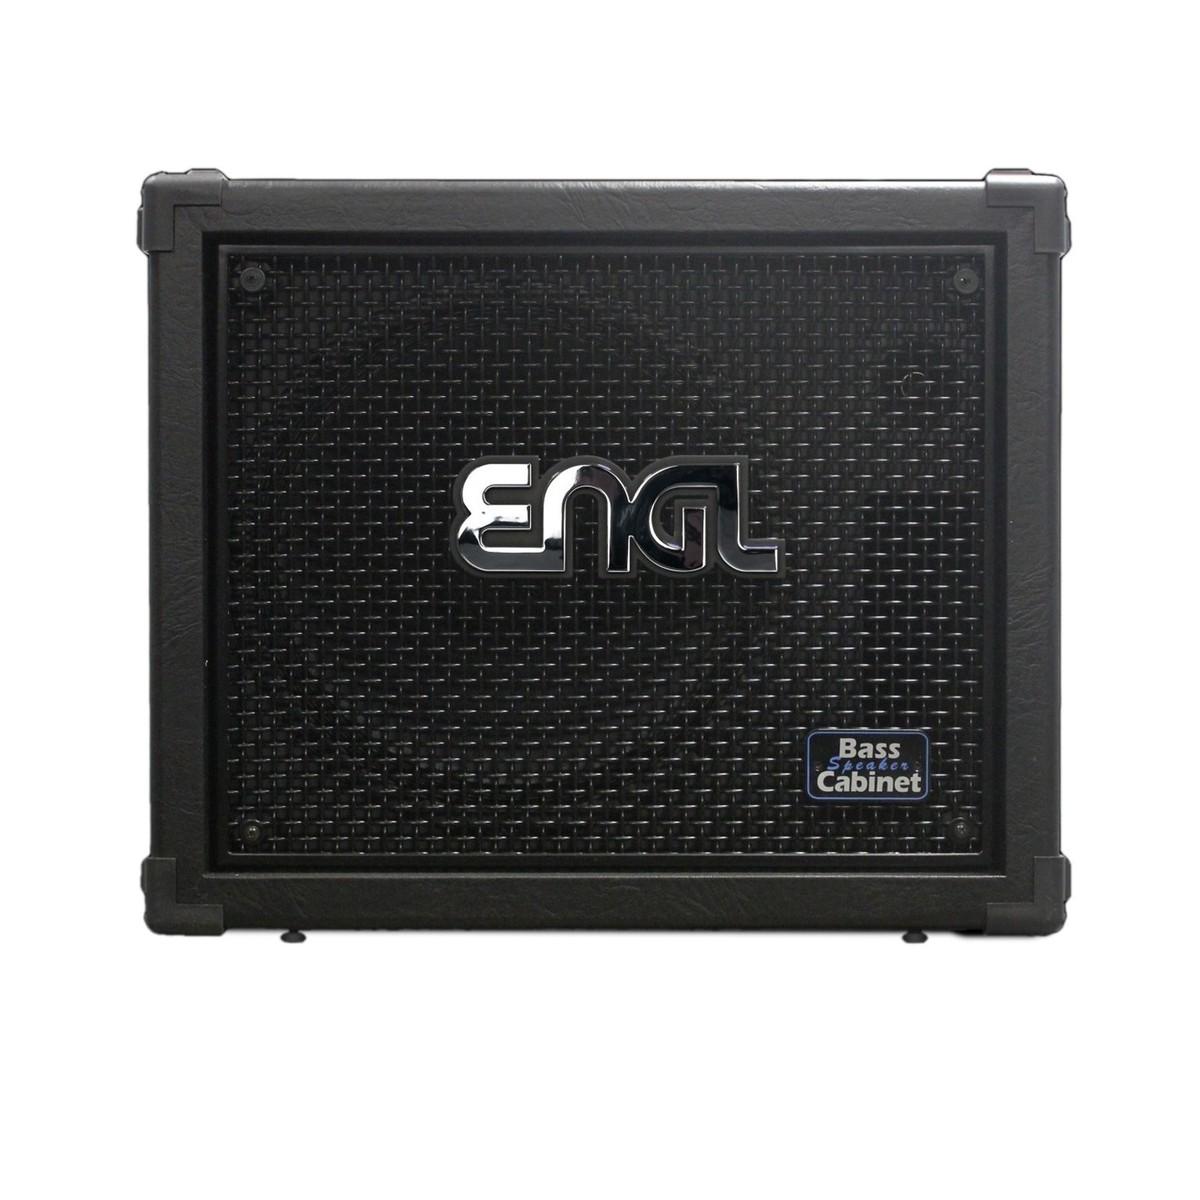 engl e115b 1 15 pro bass guitar cabinet at gear4music. Black Bedroom Furniture Sets. Home Design Ideas